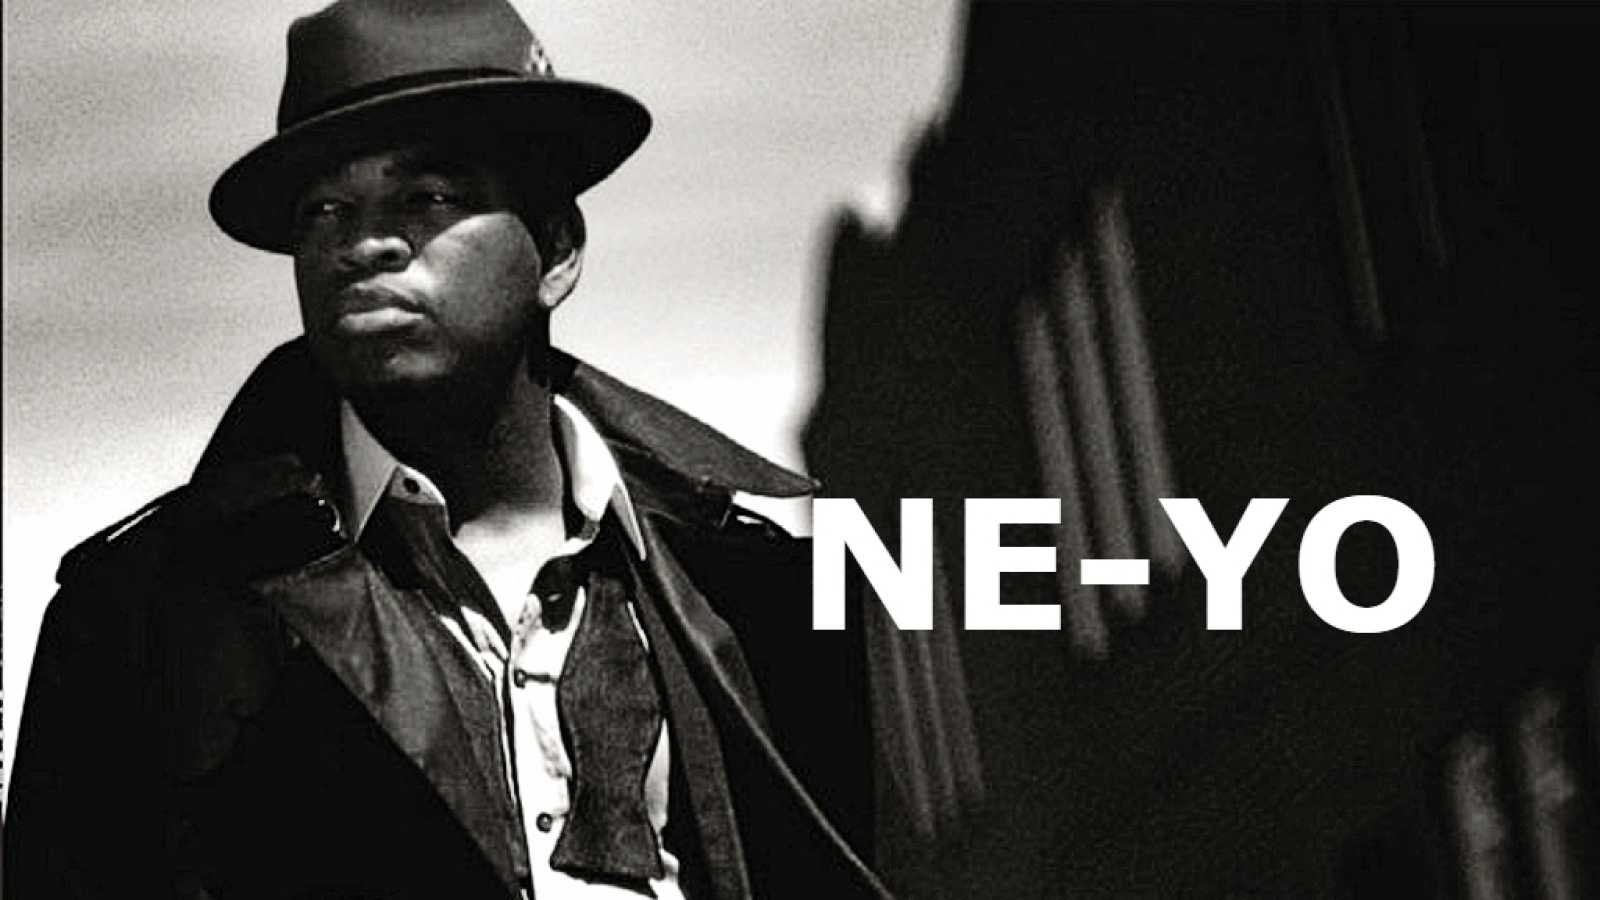 Próxima parada - Faith Evans & LL Cool J y Ne-Yo - 05/03/21 - escuchar ahora